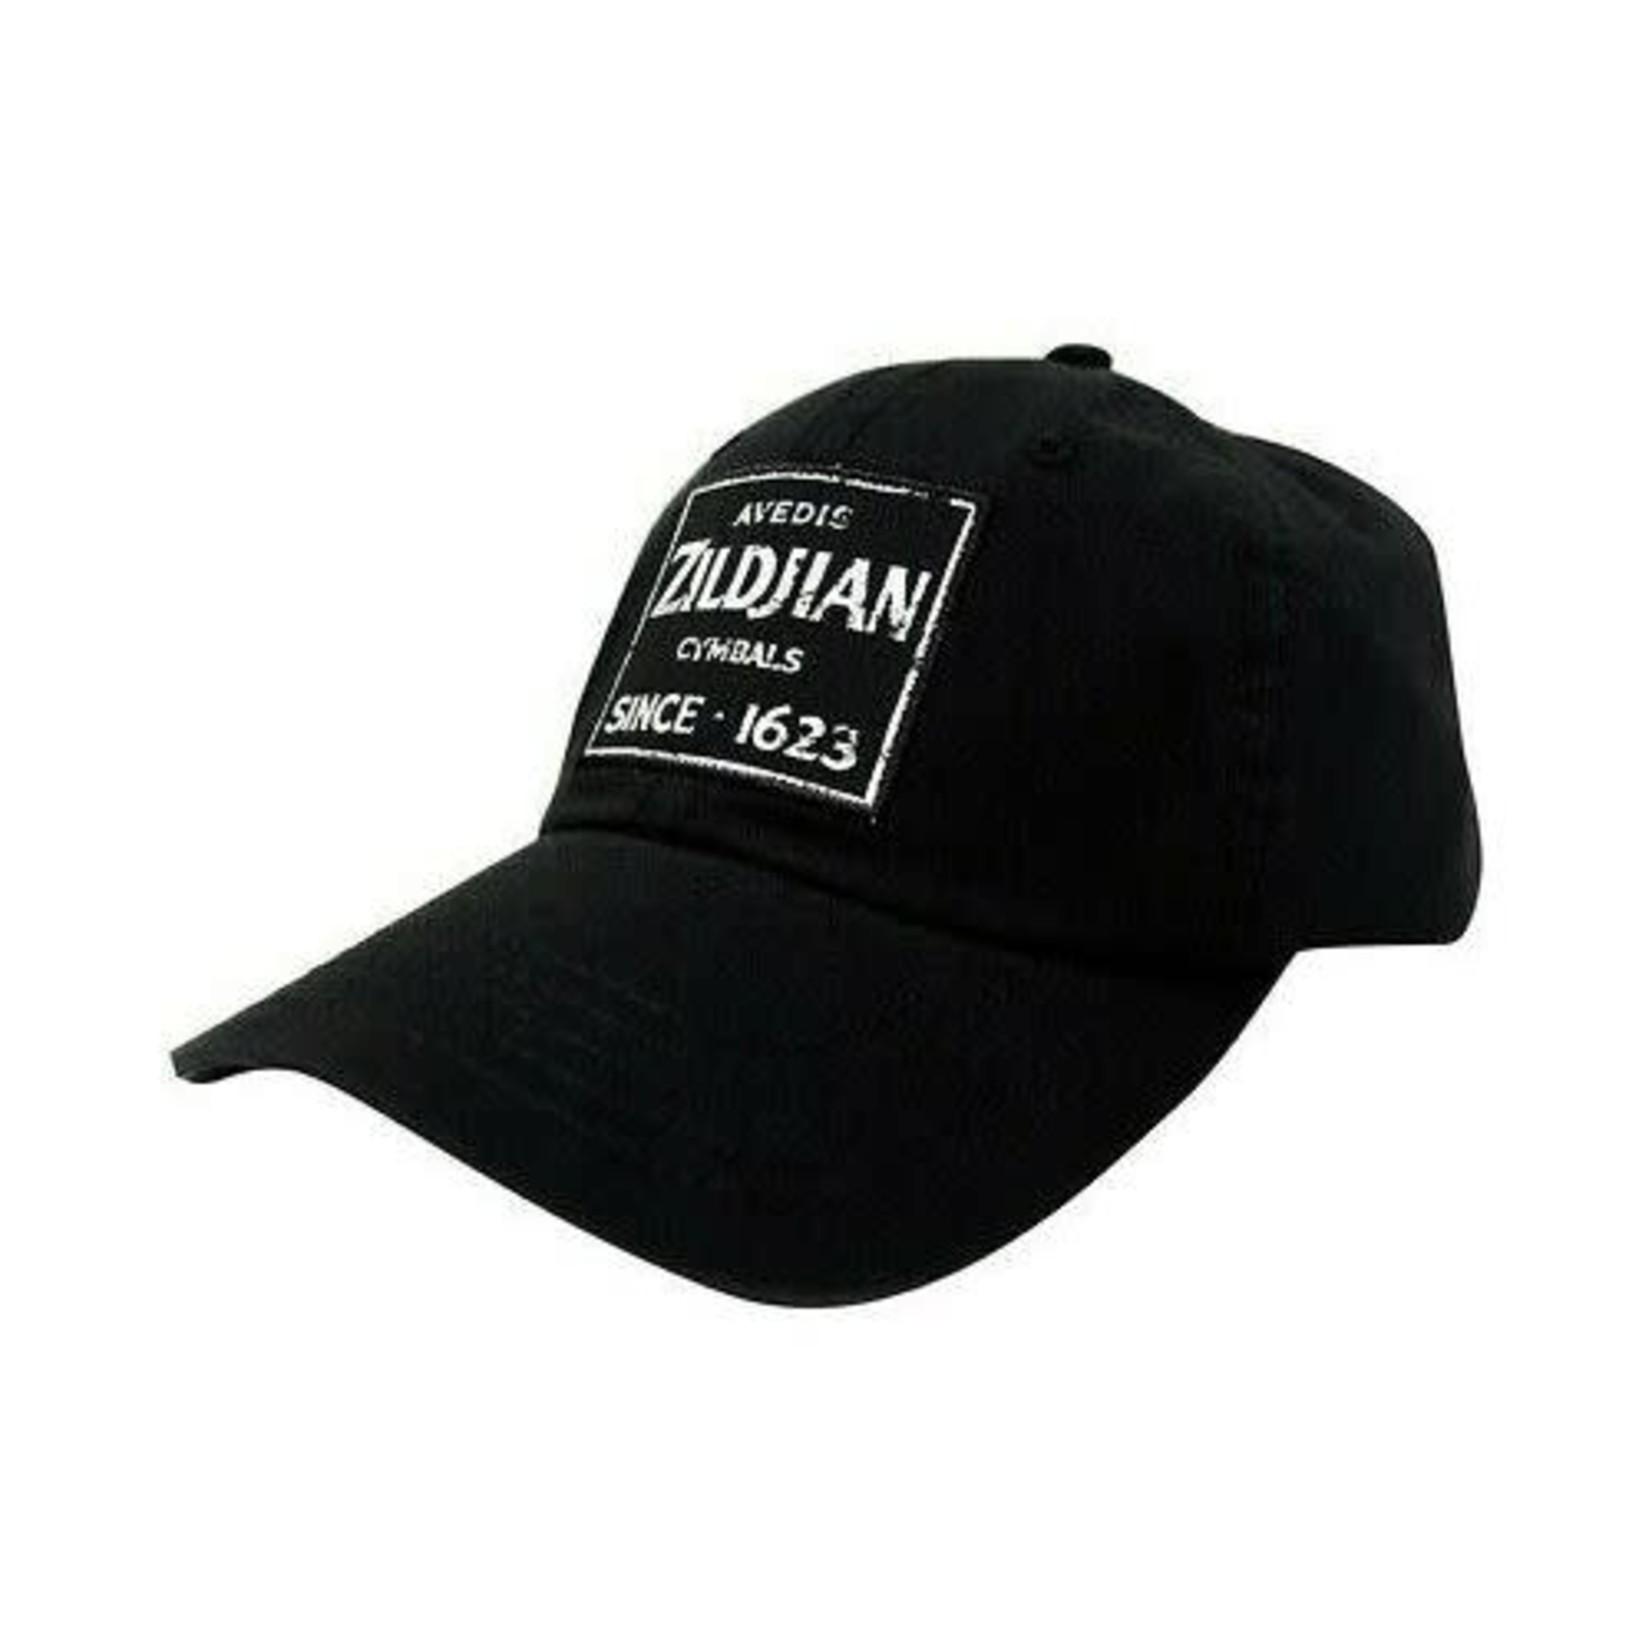 Zildjian ZILDJIAN VINTAGE SIGNATURE HAT